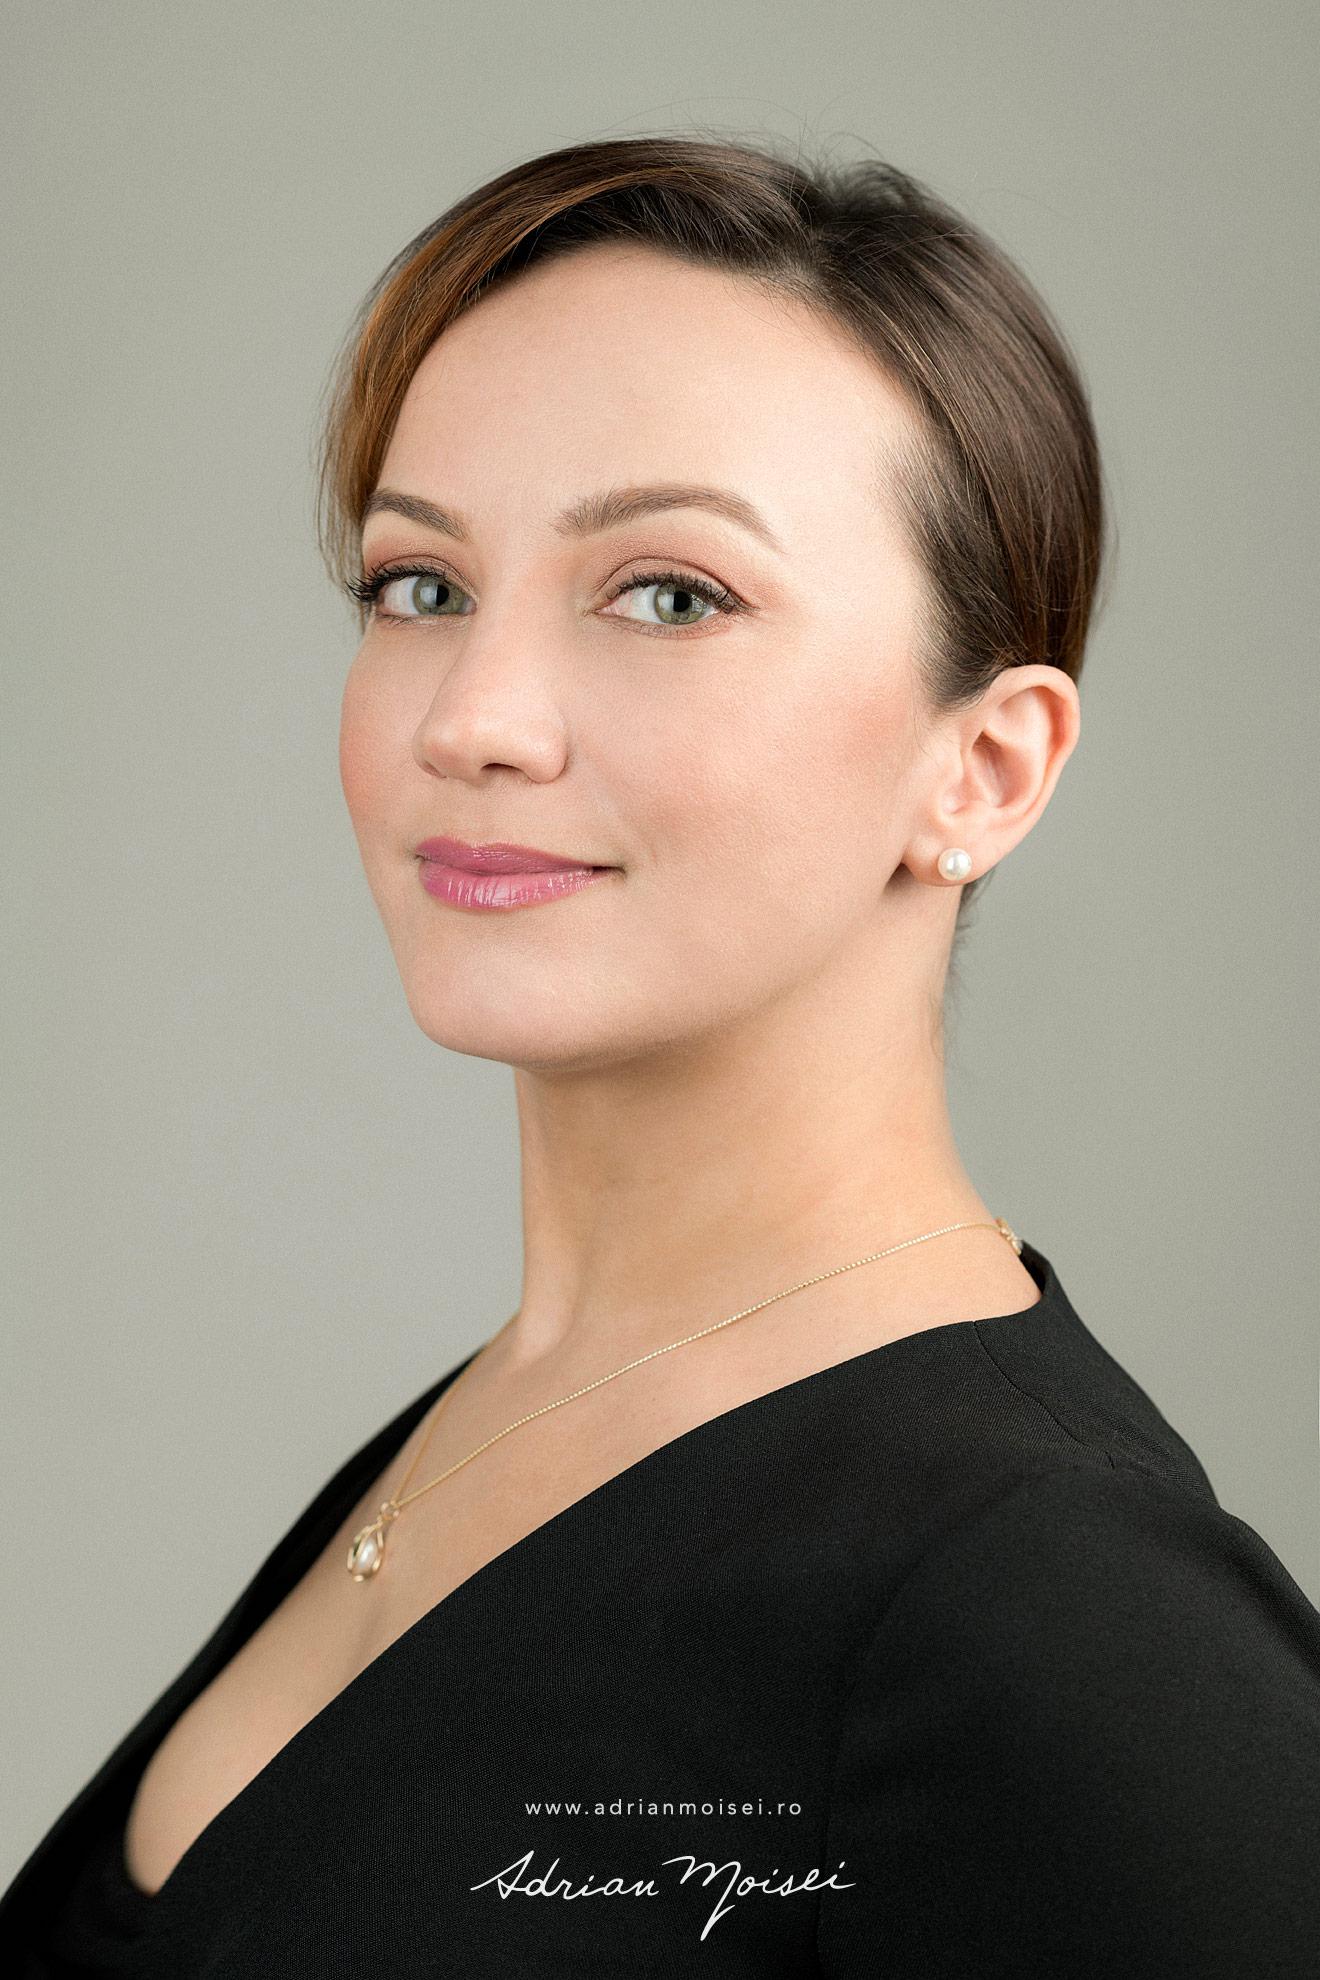 Corporate headshots Iasi, studio foto Adrian Moisei